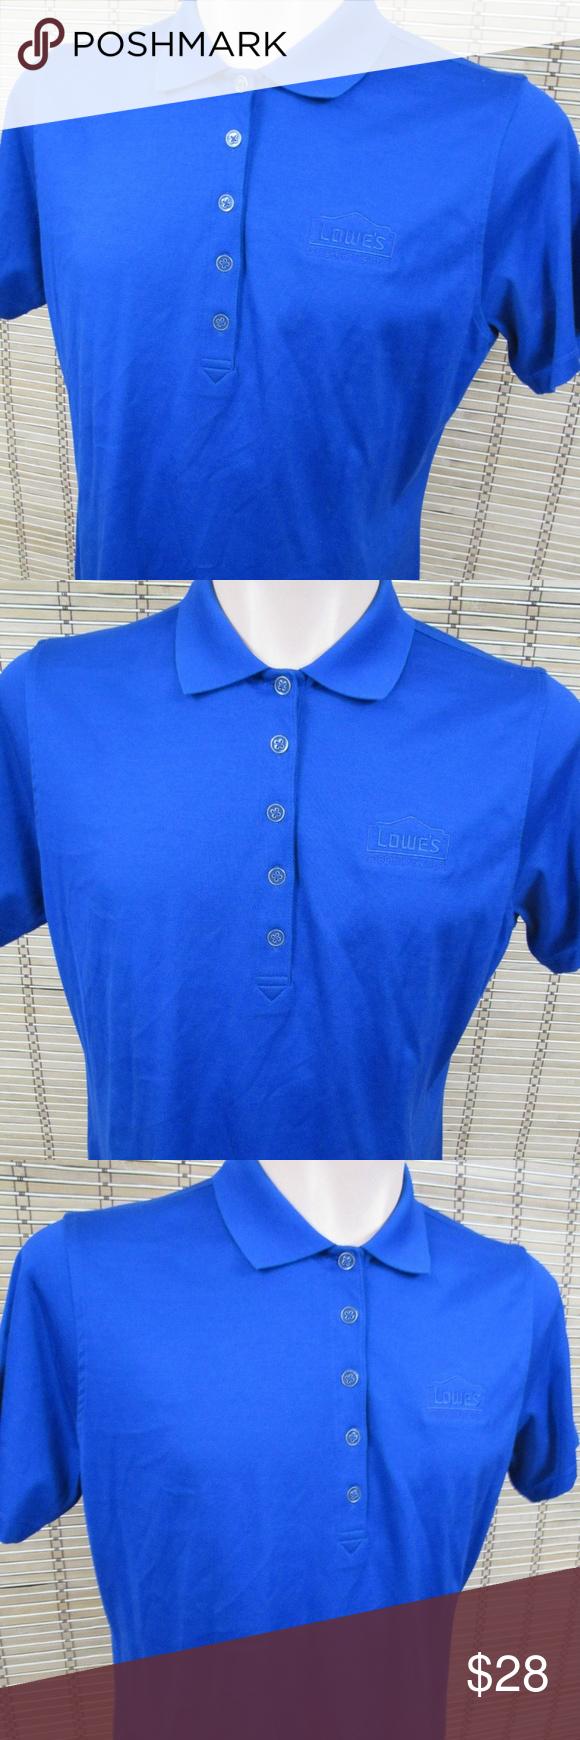 Peter Millar Moisture Mens Sz XL LOWES Polo Shirt